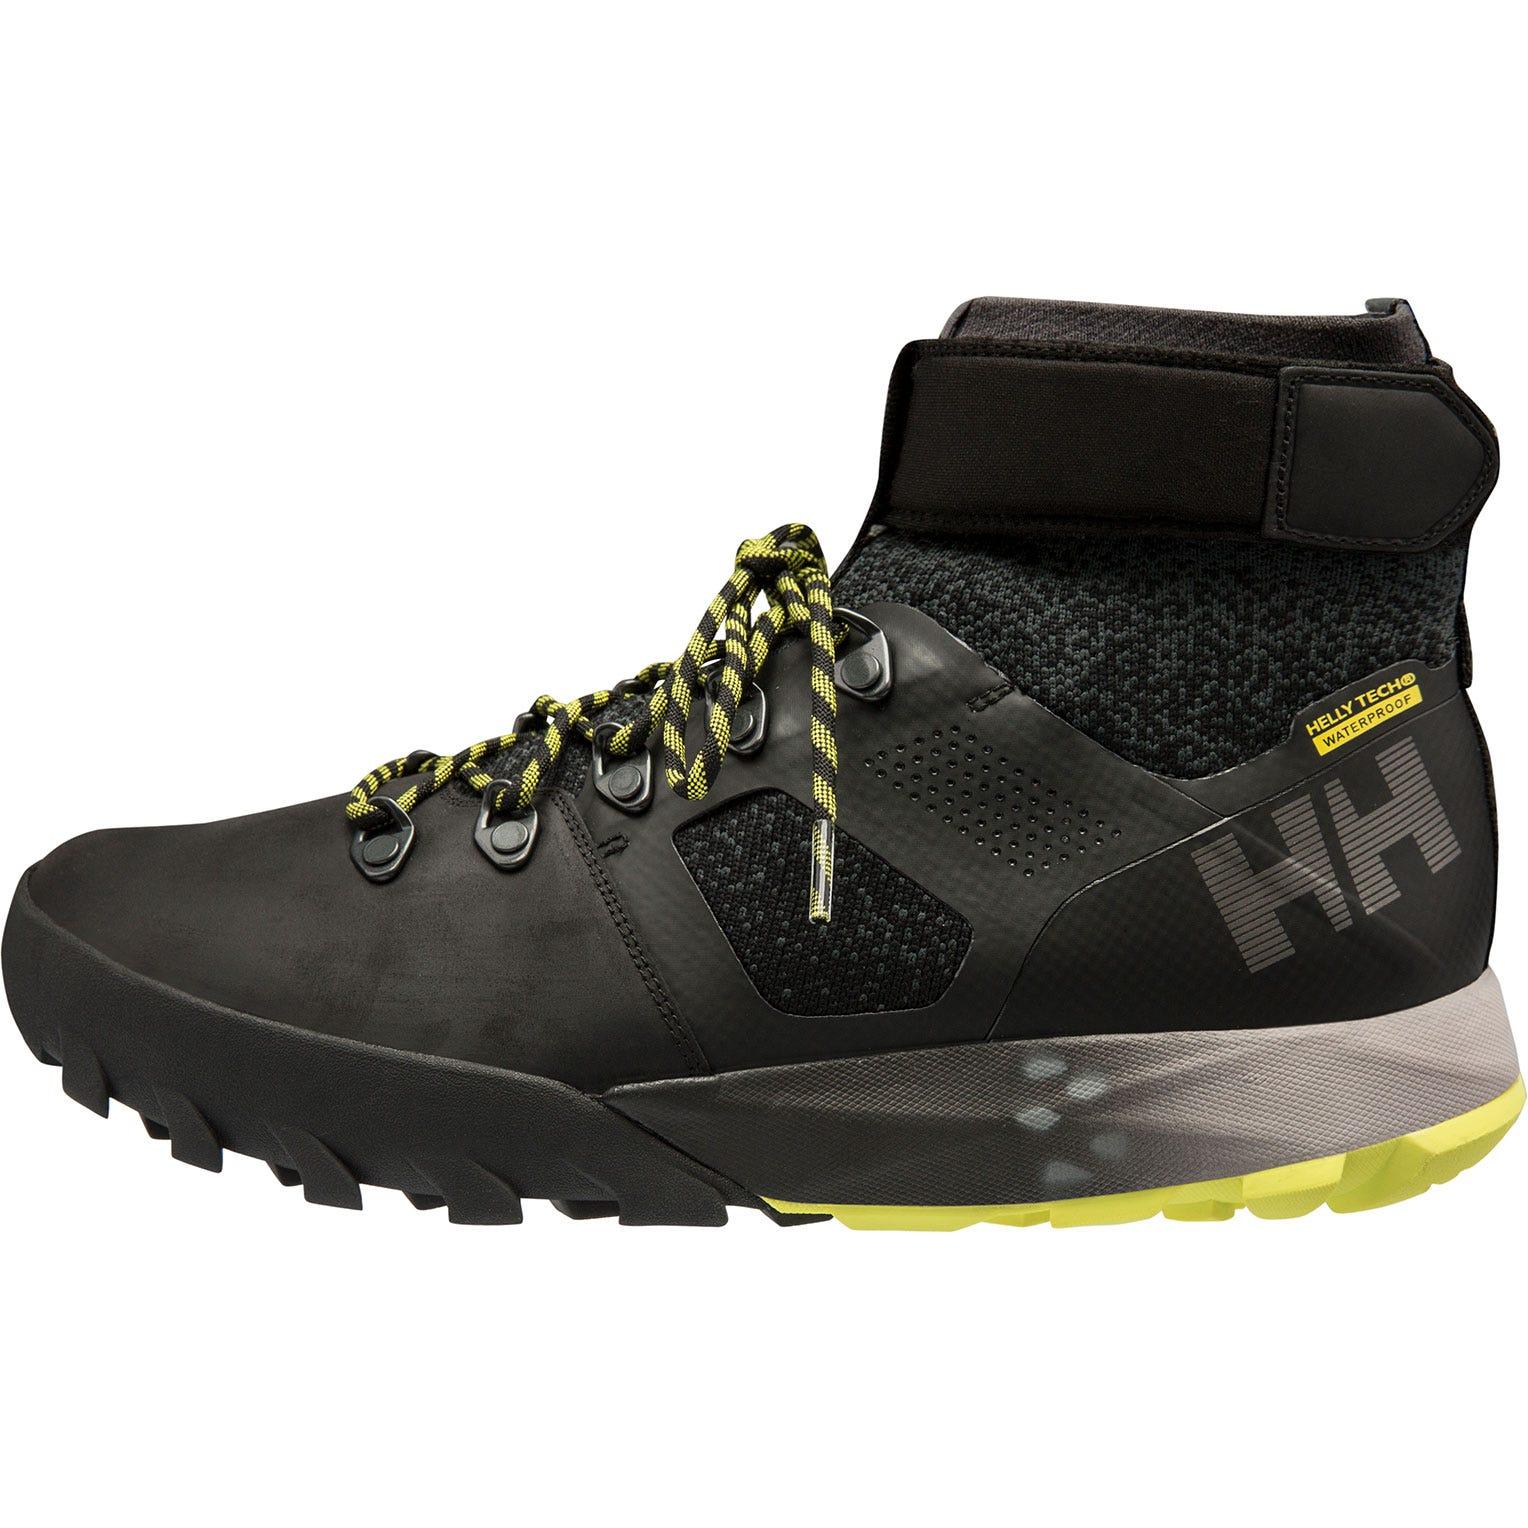 Helly Hansen Loke Vanquish Ht Mens Hiking Boot Black 42.5/9